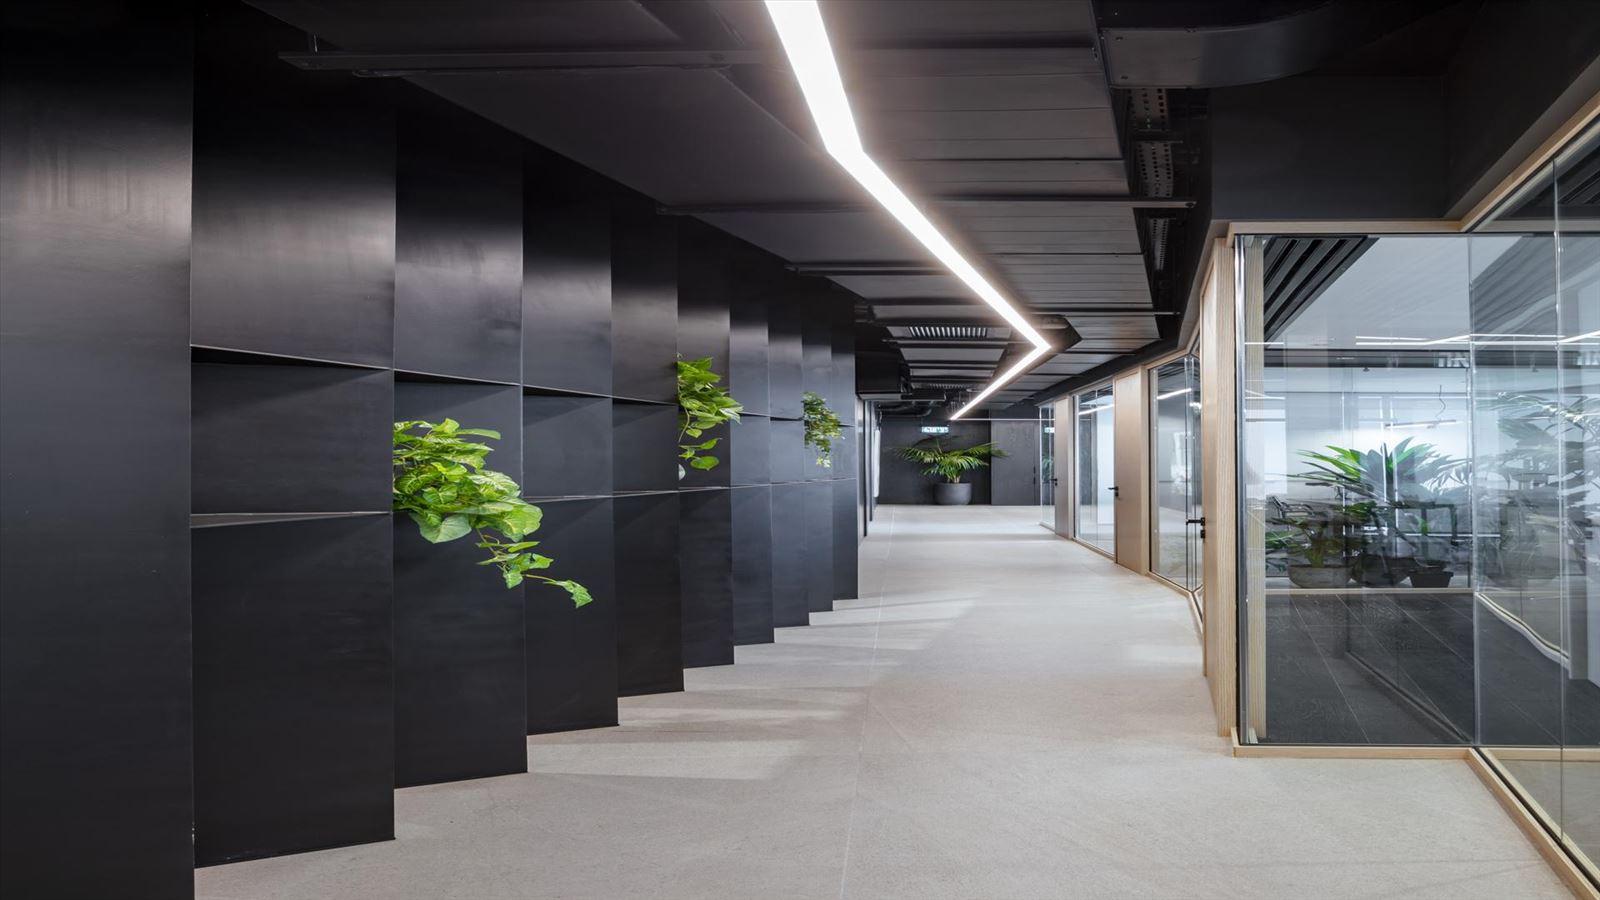 Fortissimo Offices – Tel Aviv מסדרון בעיצוב גוף תאורה בעיצוב דורי קמחי